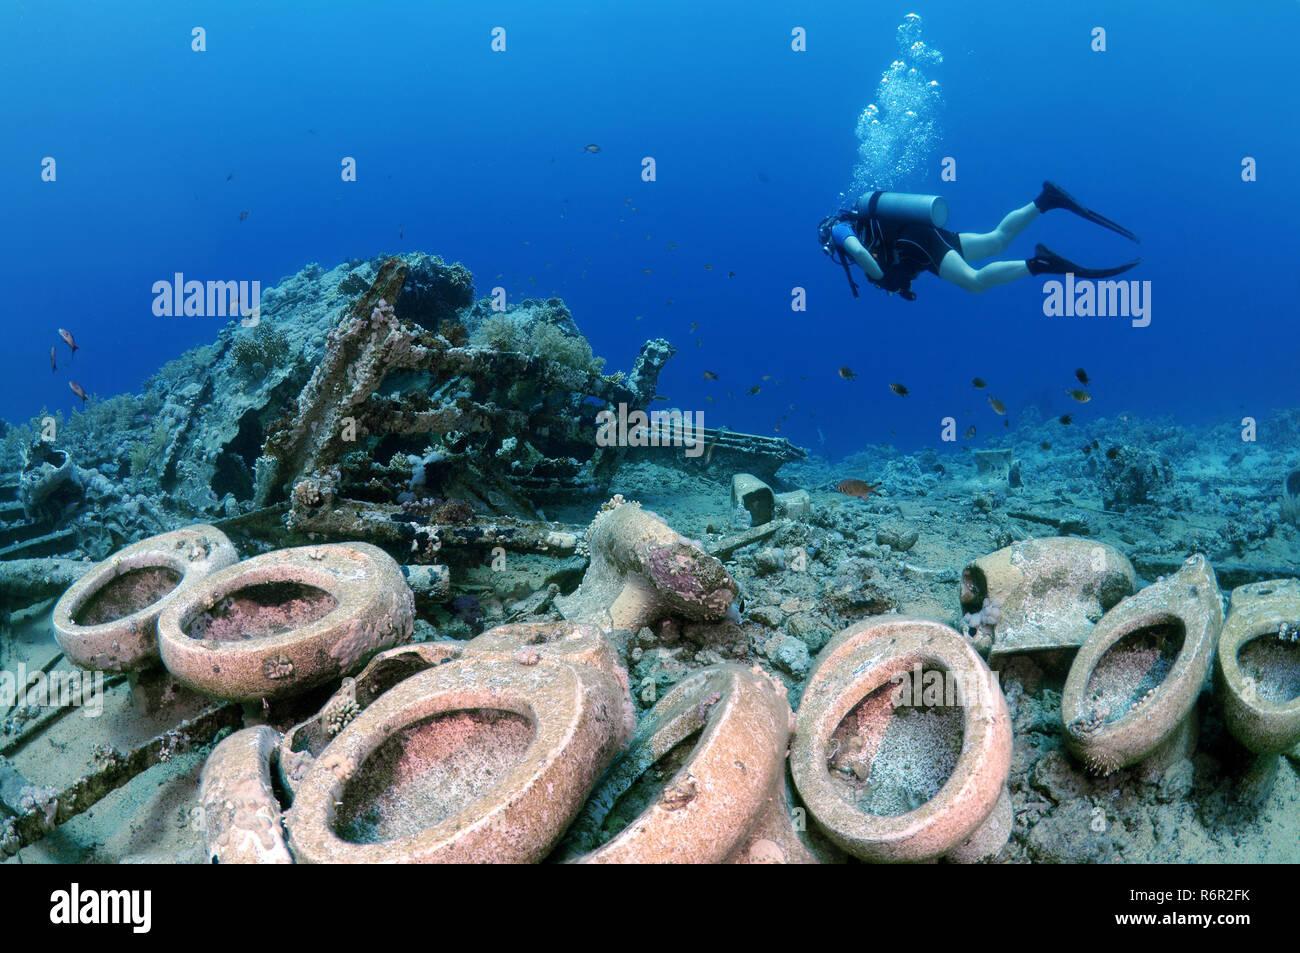 Male Scuba diver looking at the toilets on the Wreck of Yolanda, Shark Yolanda reef, Ras Mohammed national park, Sinai, Sharm el-Sheikh, Red sea, Egyp - Stock Image